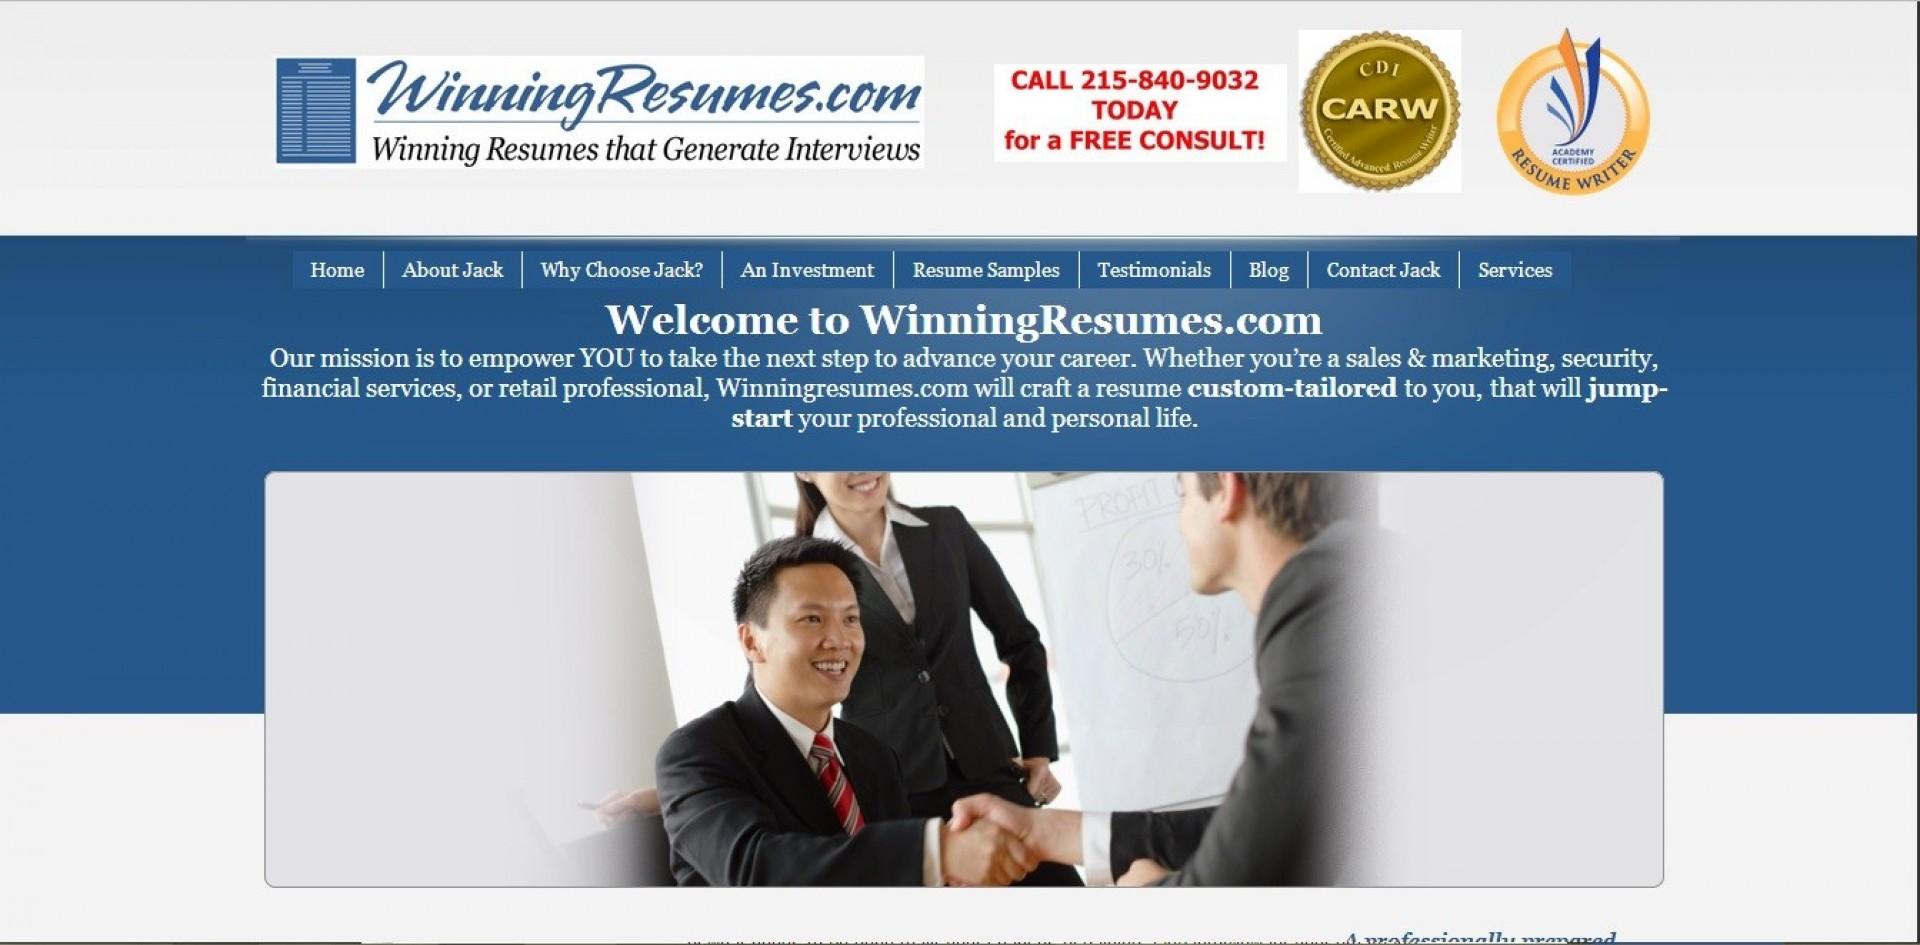 006 Winningresumes Com Review Essay Example Custom Writing Impressive Service Are Services Legal Free Canada 1920